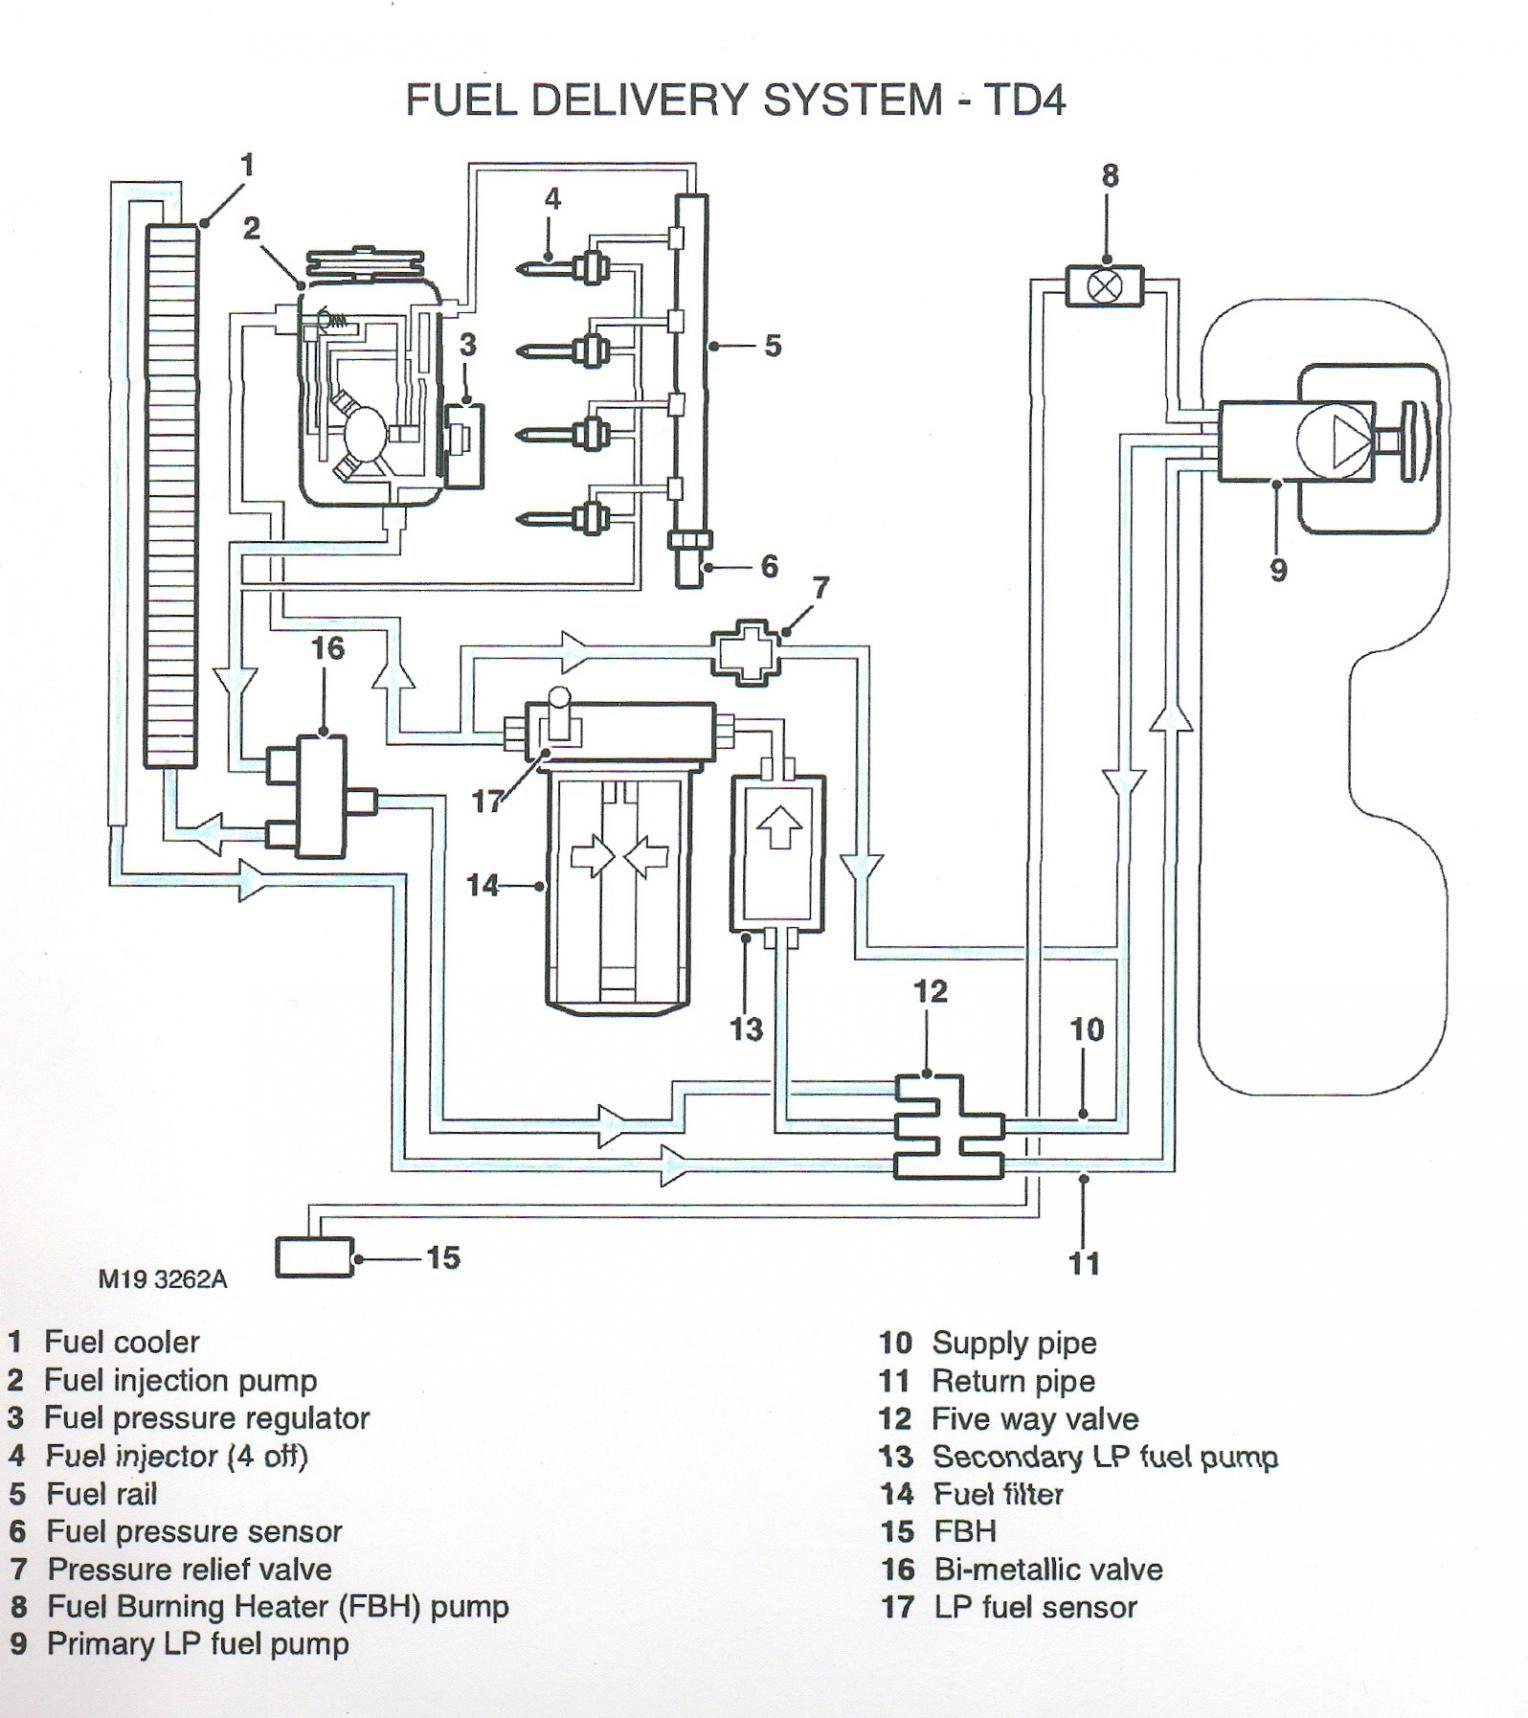 land rover freelander engine diagram power steering gear box td4 wiring 29 images